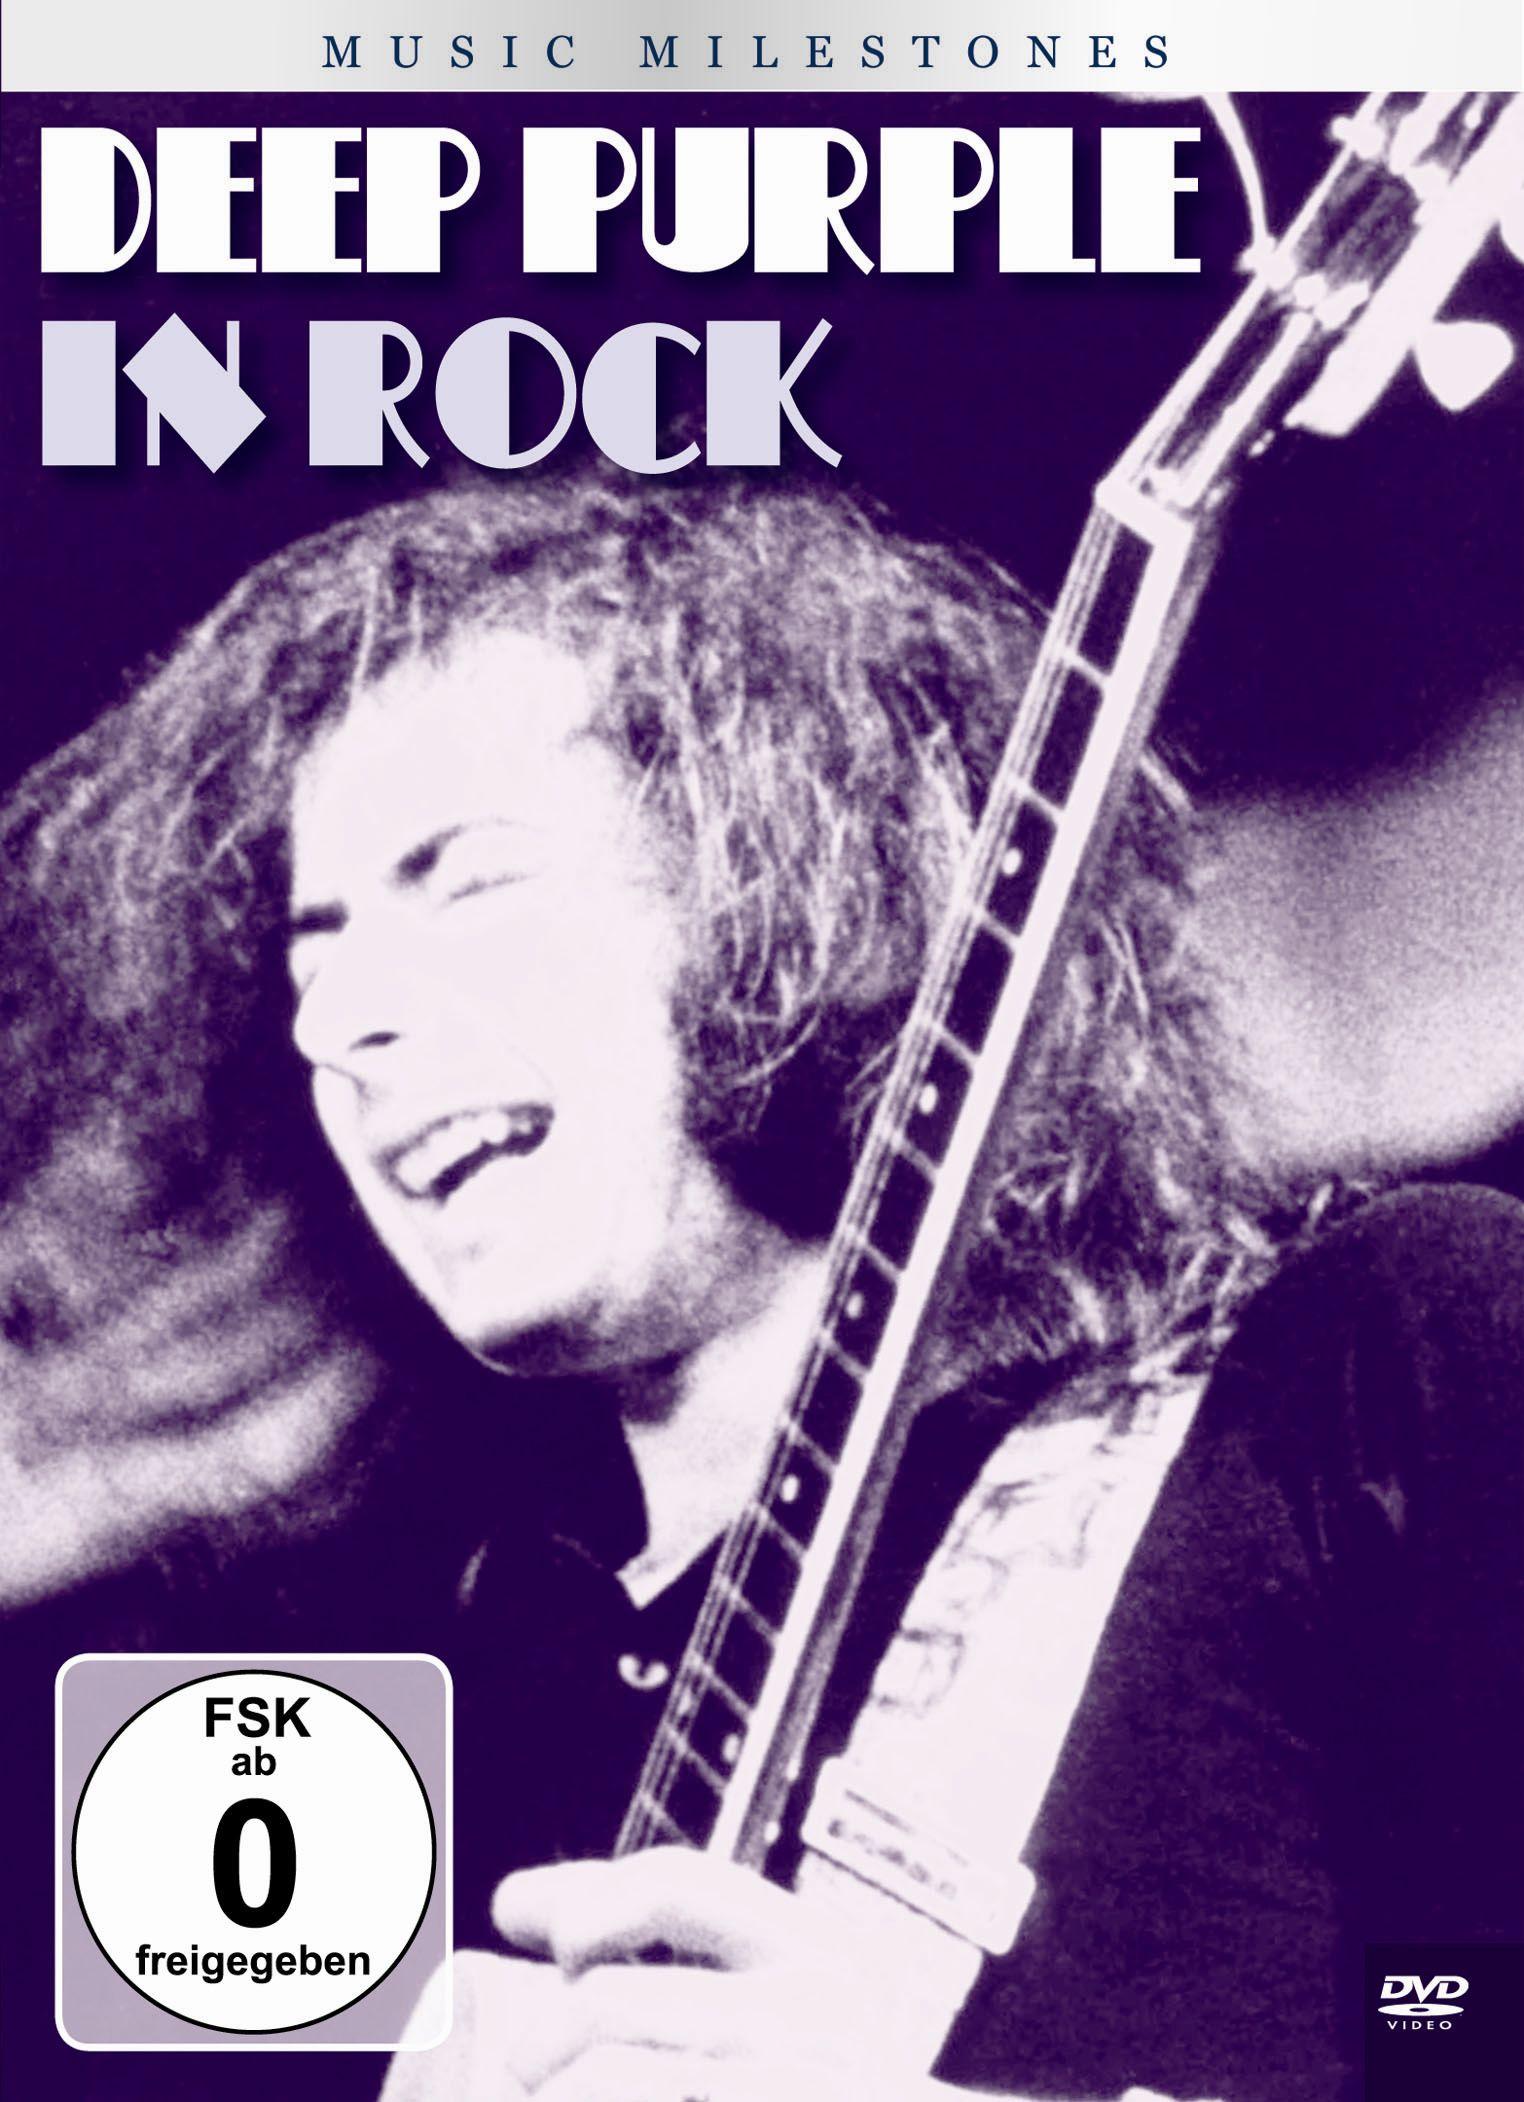 Deep Purple: Music Milestones - Deep Purple in Rock